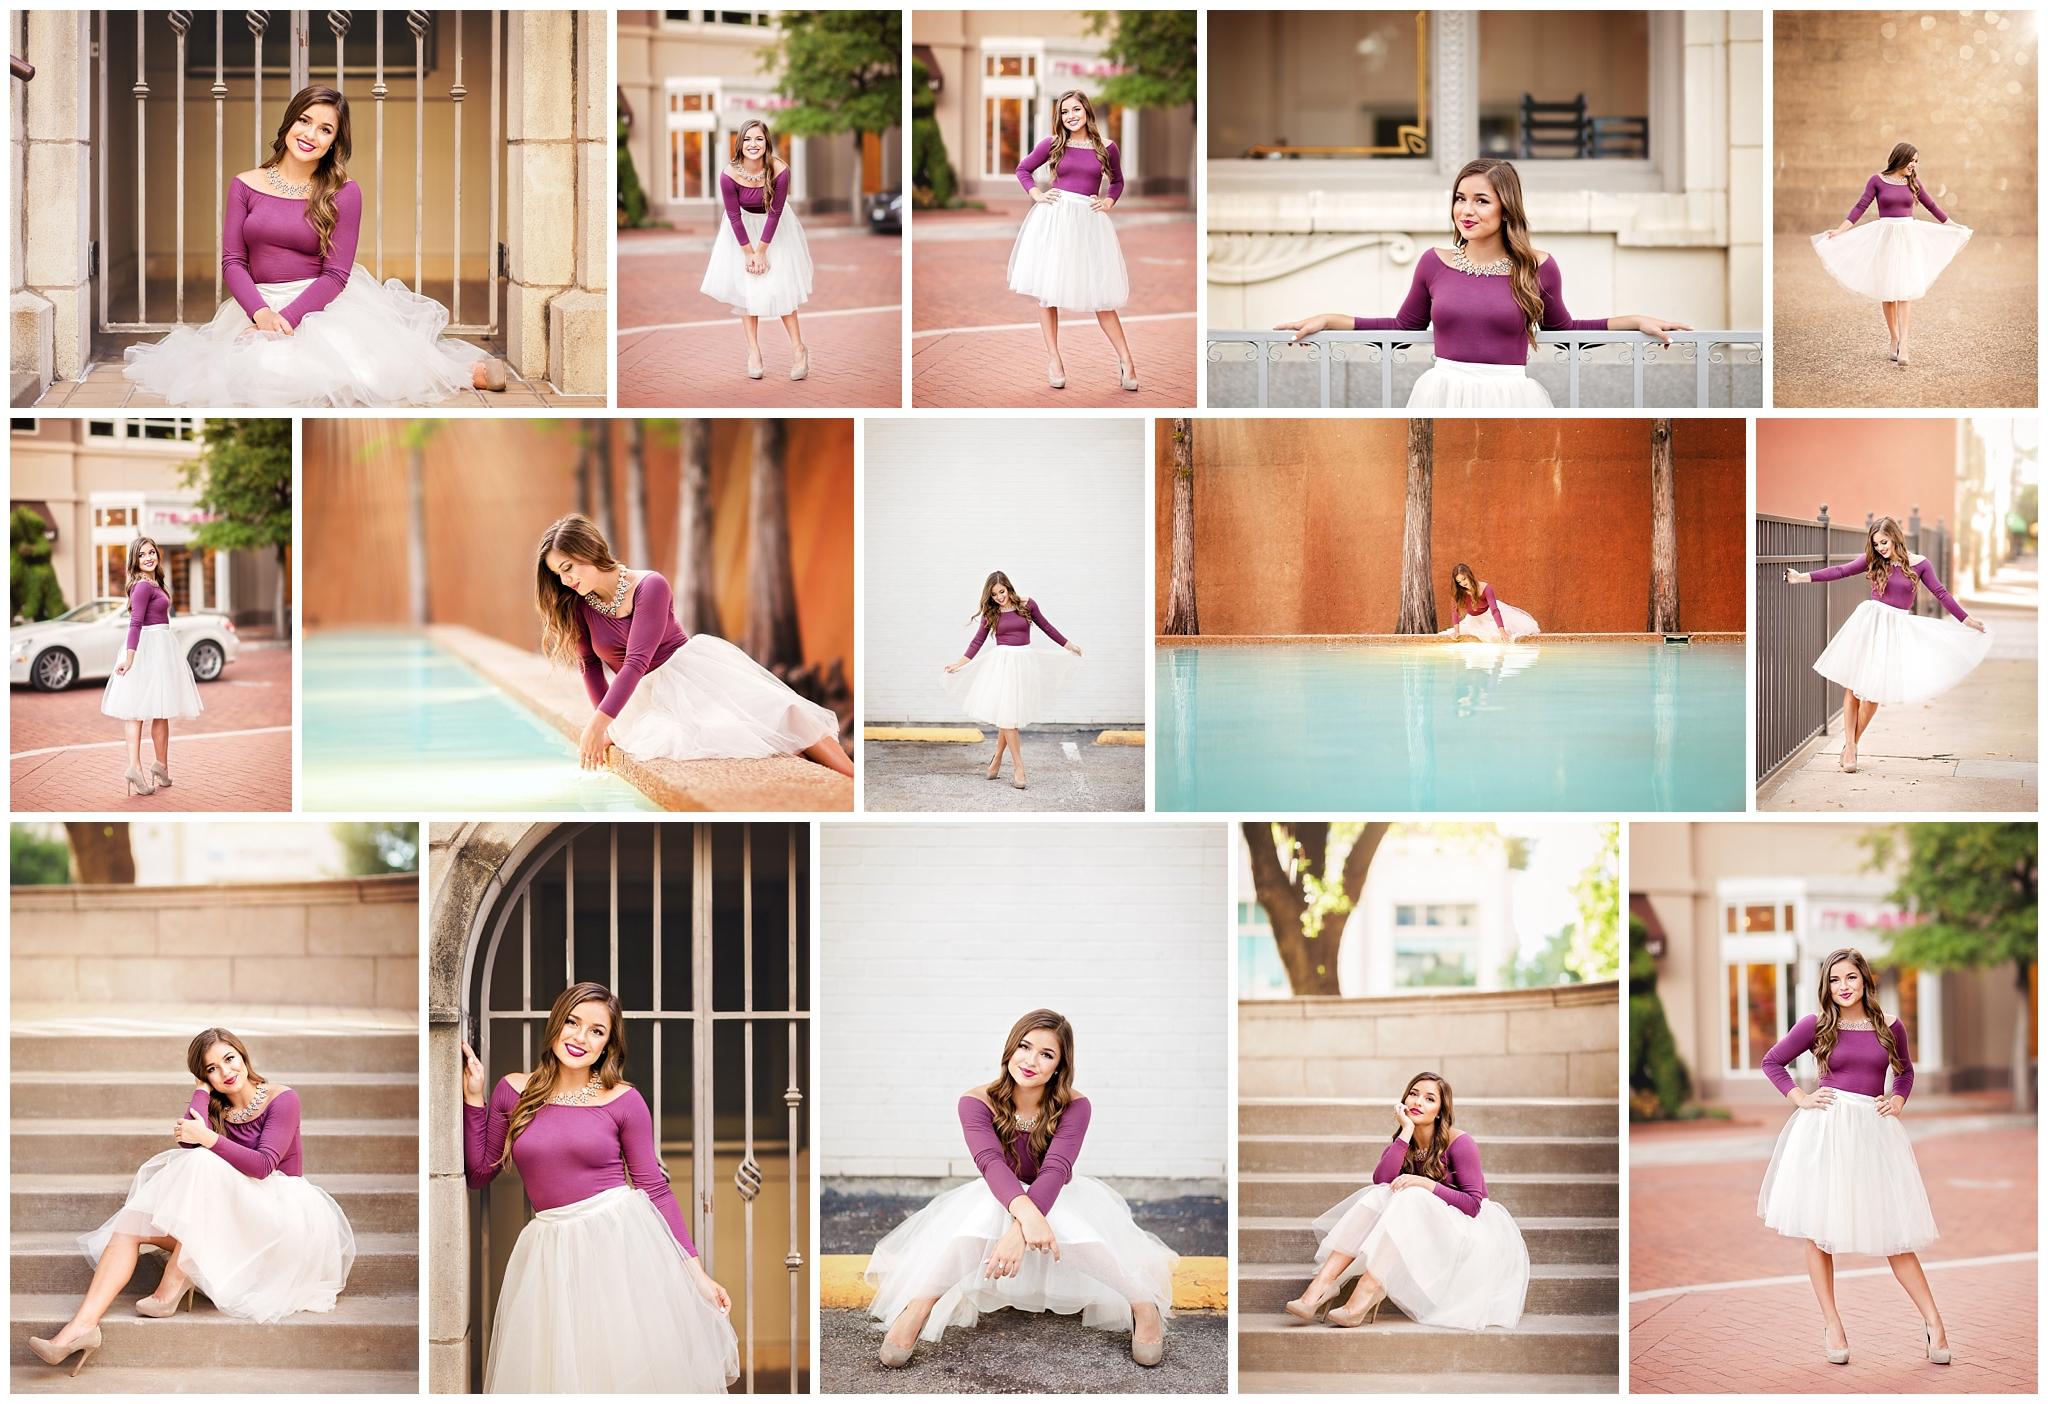 kylee-swisher-photography-senior-photographer-dfw-texas-fort-worth-colleyville-texas-high-school